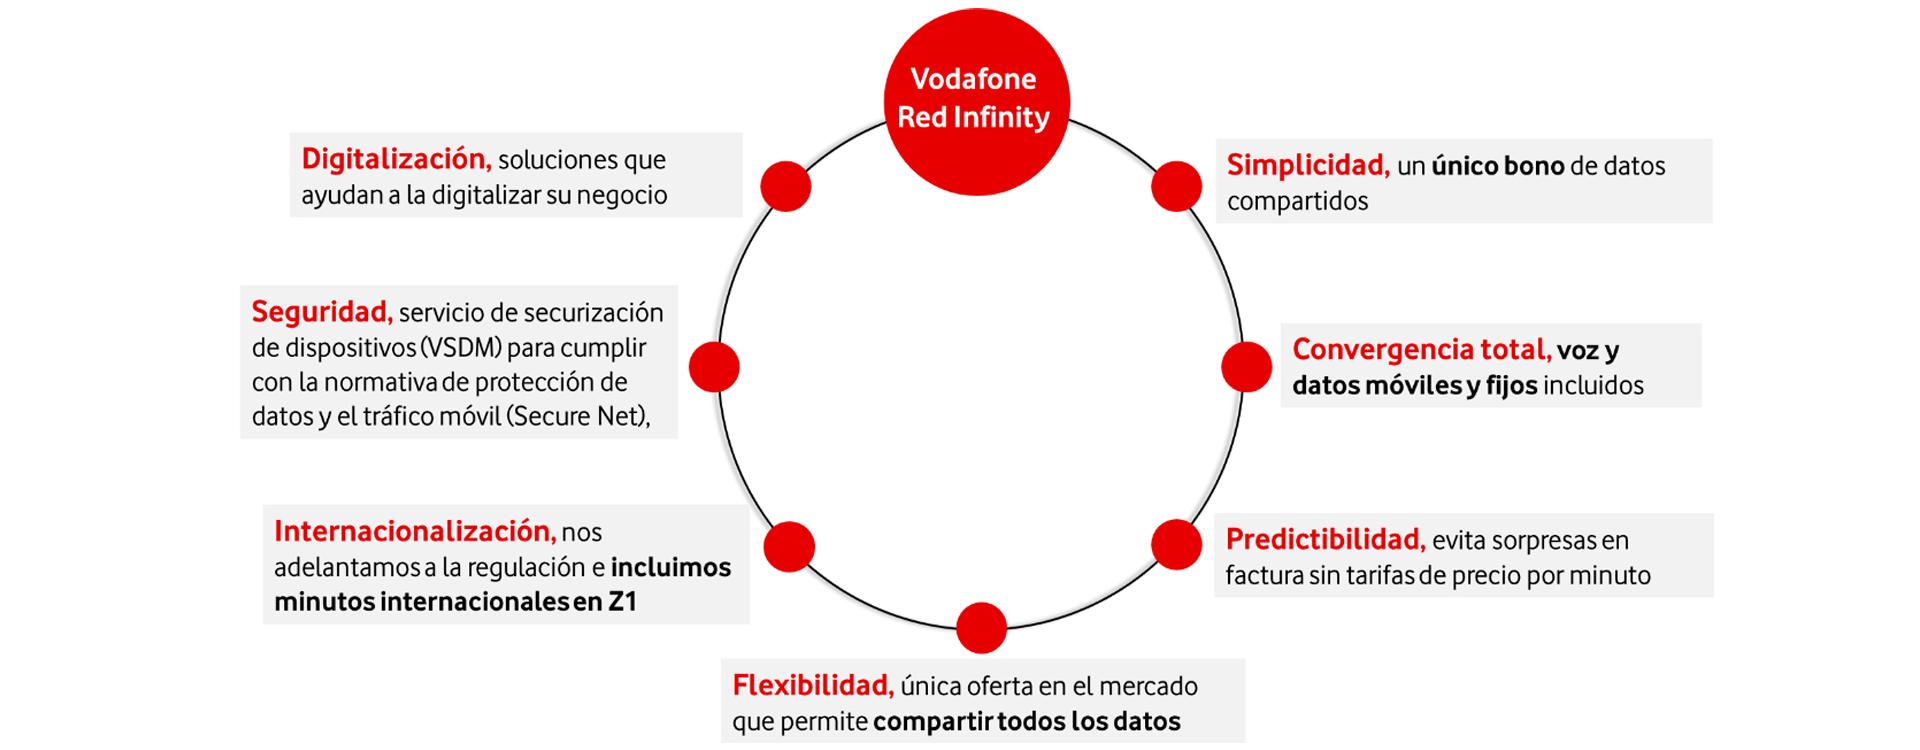 RedInfinity